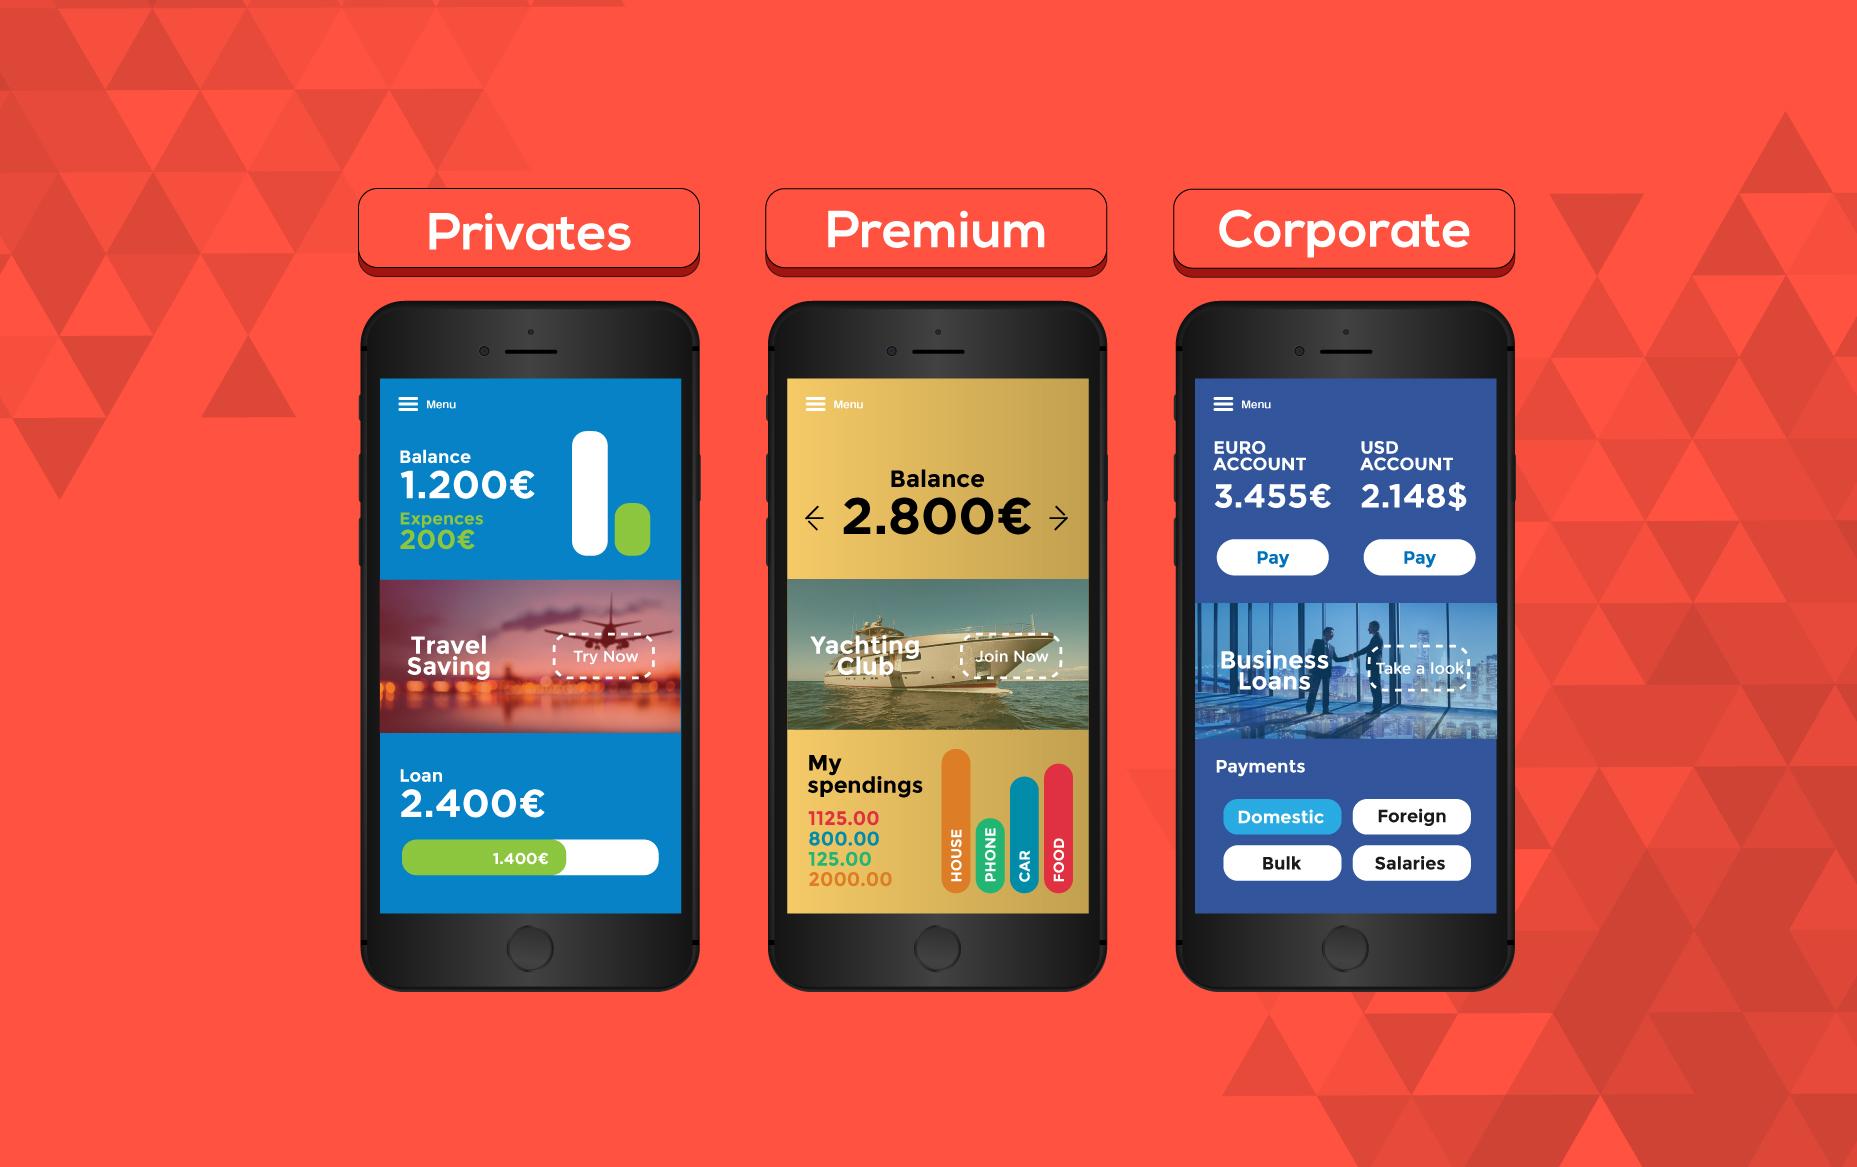 The True Digital Mobile Banking App